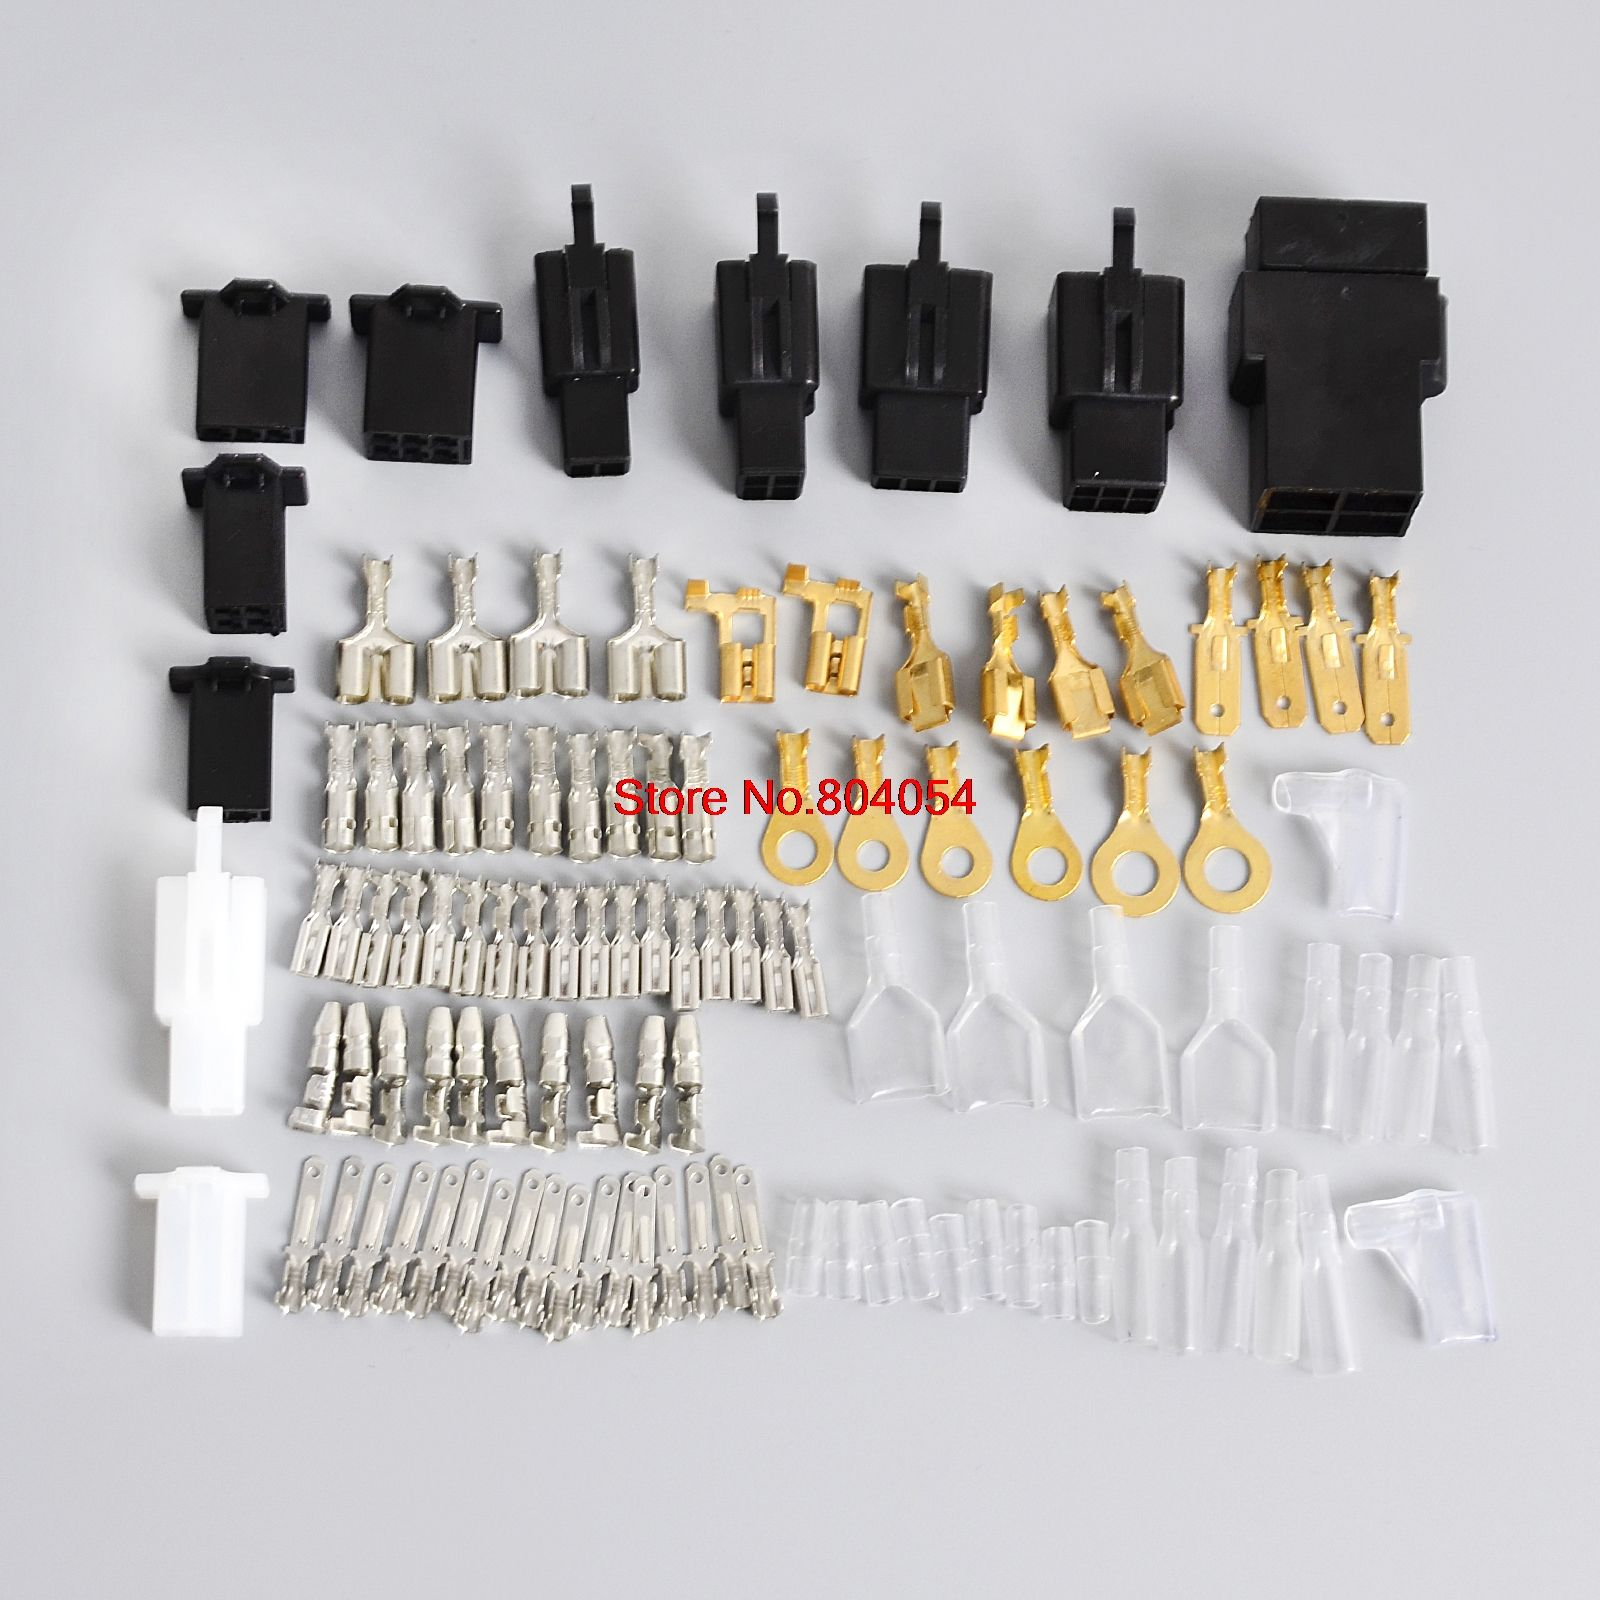 For Honda Motorcycle Electrical Wiring Harness Loom Repair Kit Plugs Bullets Connectors Motorcycle Wiring Harness Repair